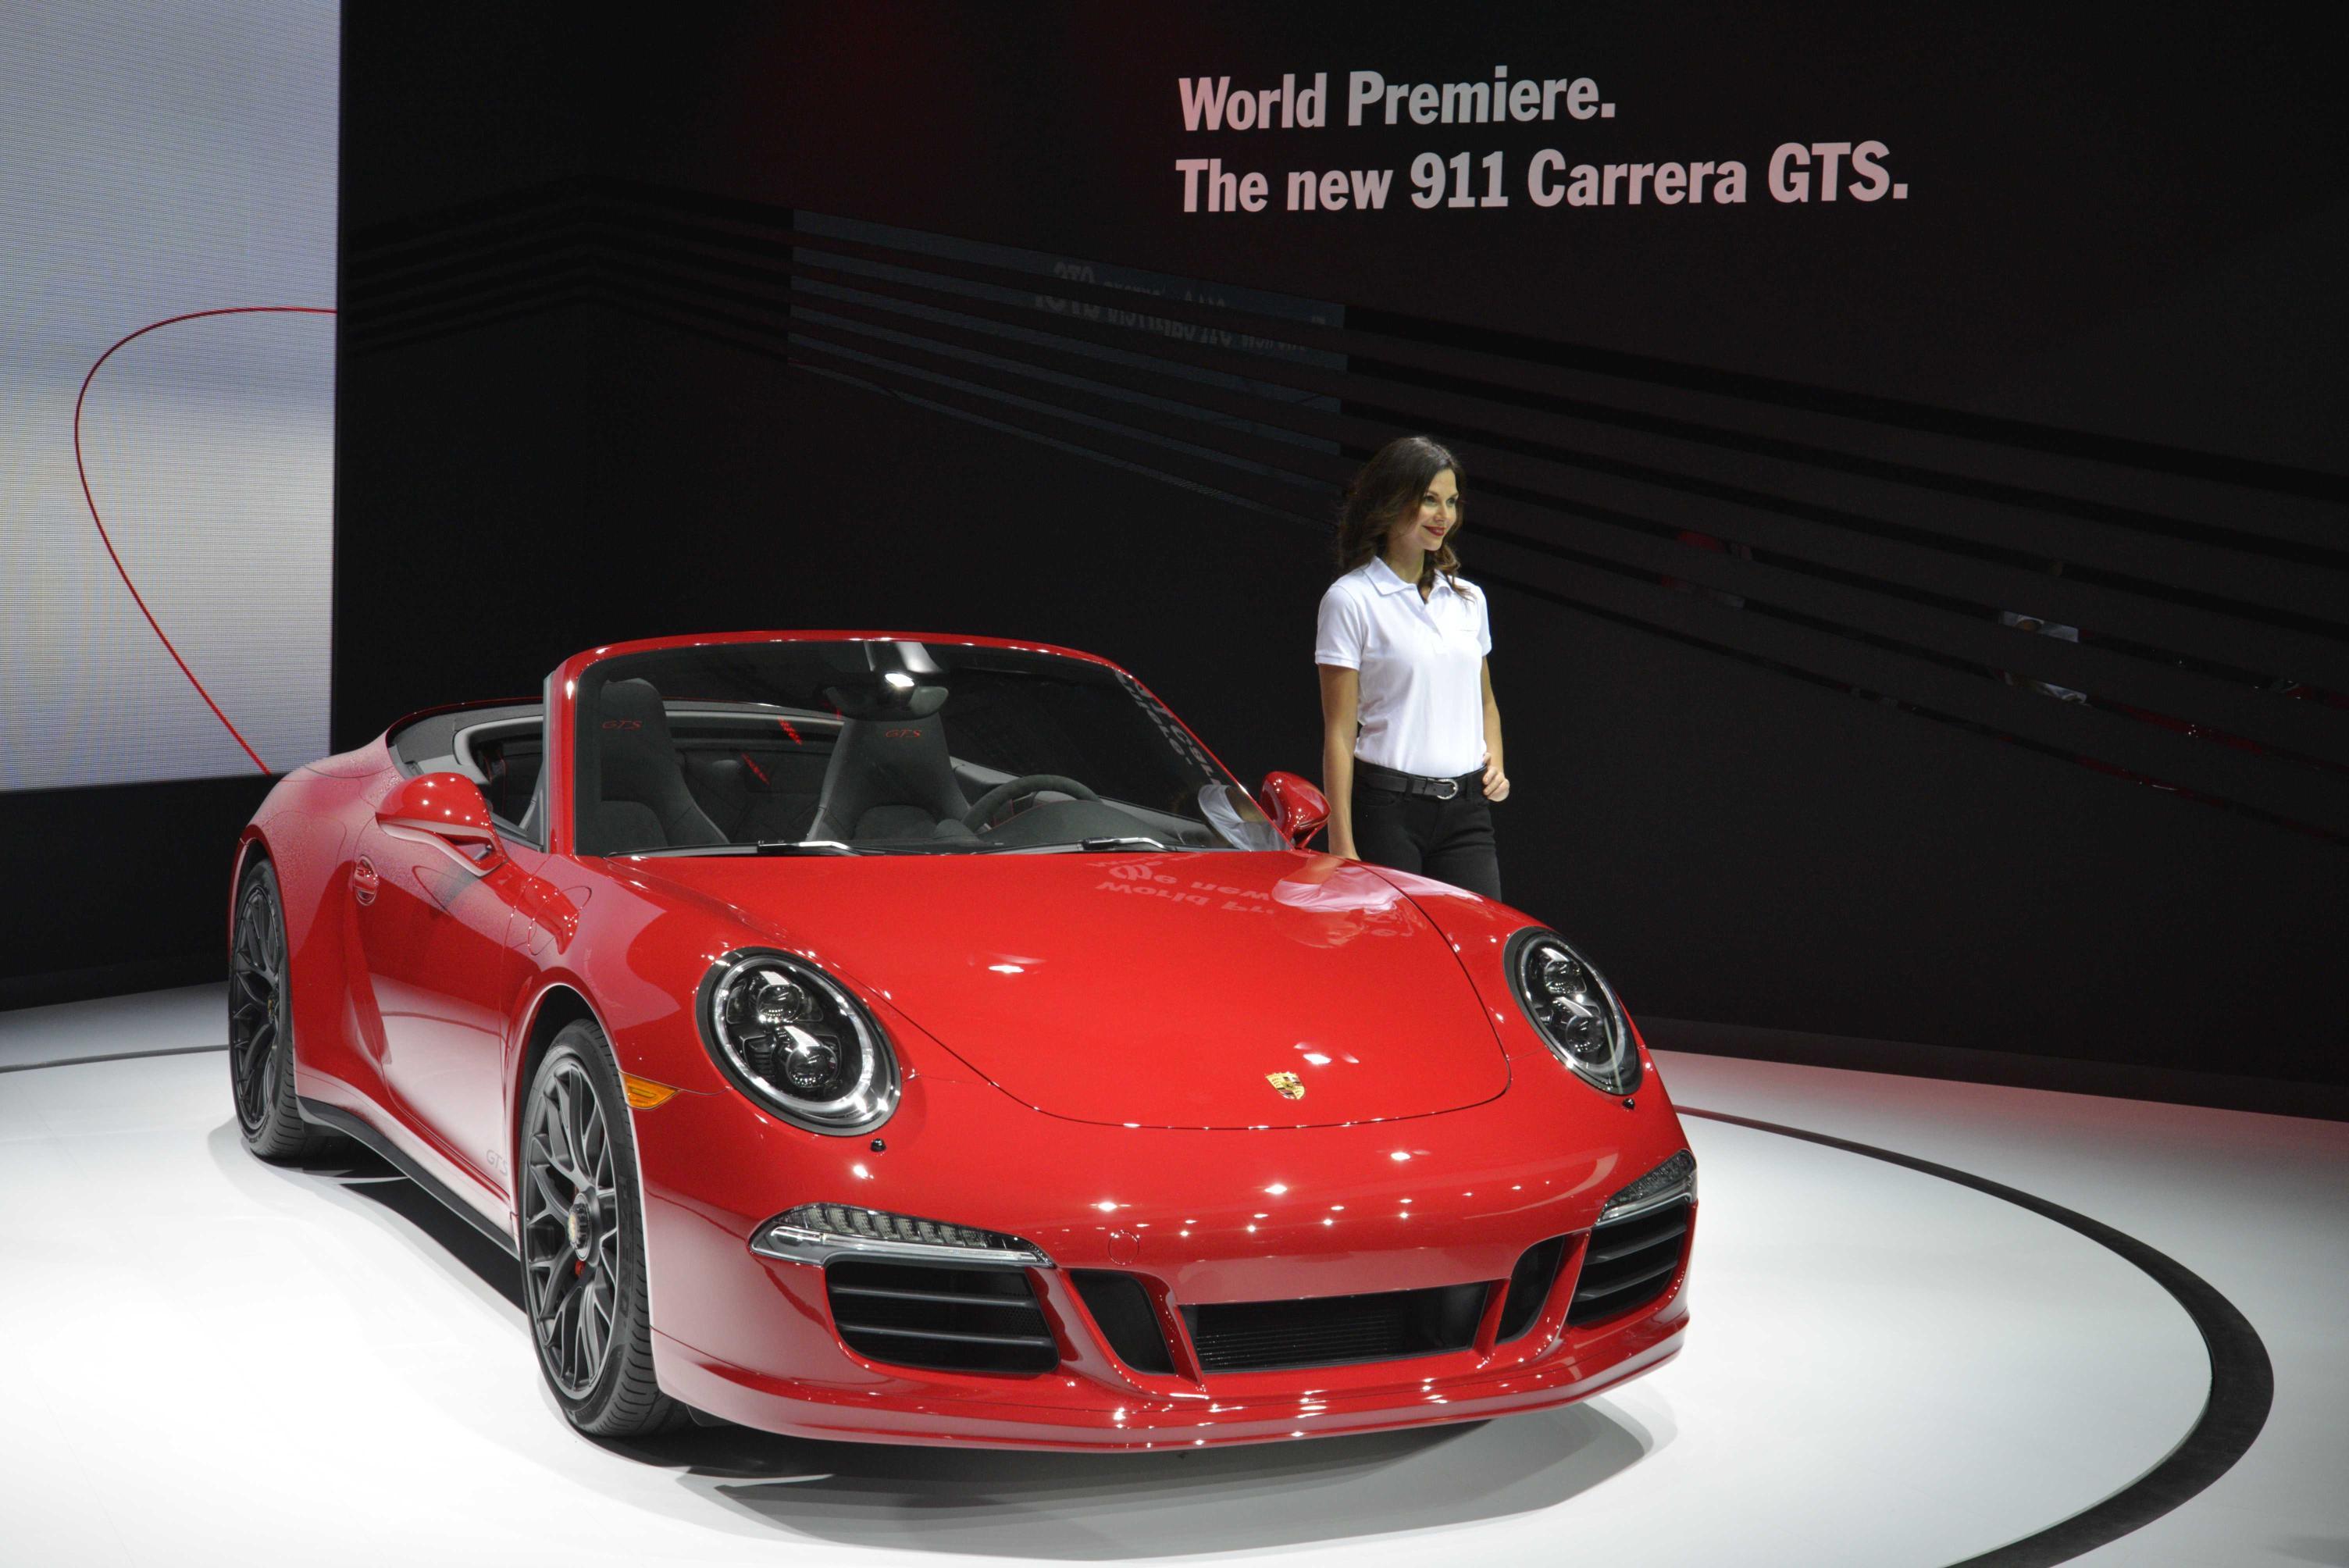 100 porsche gts porsche 911 carrera gts review pictures